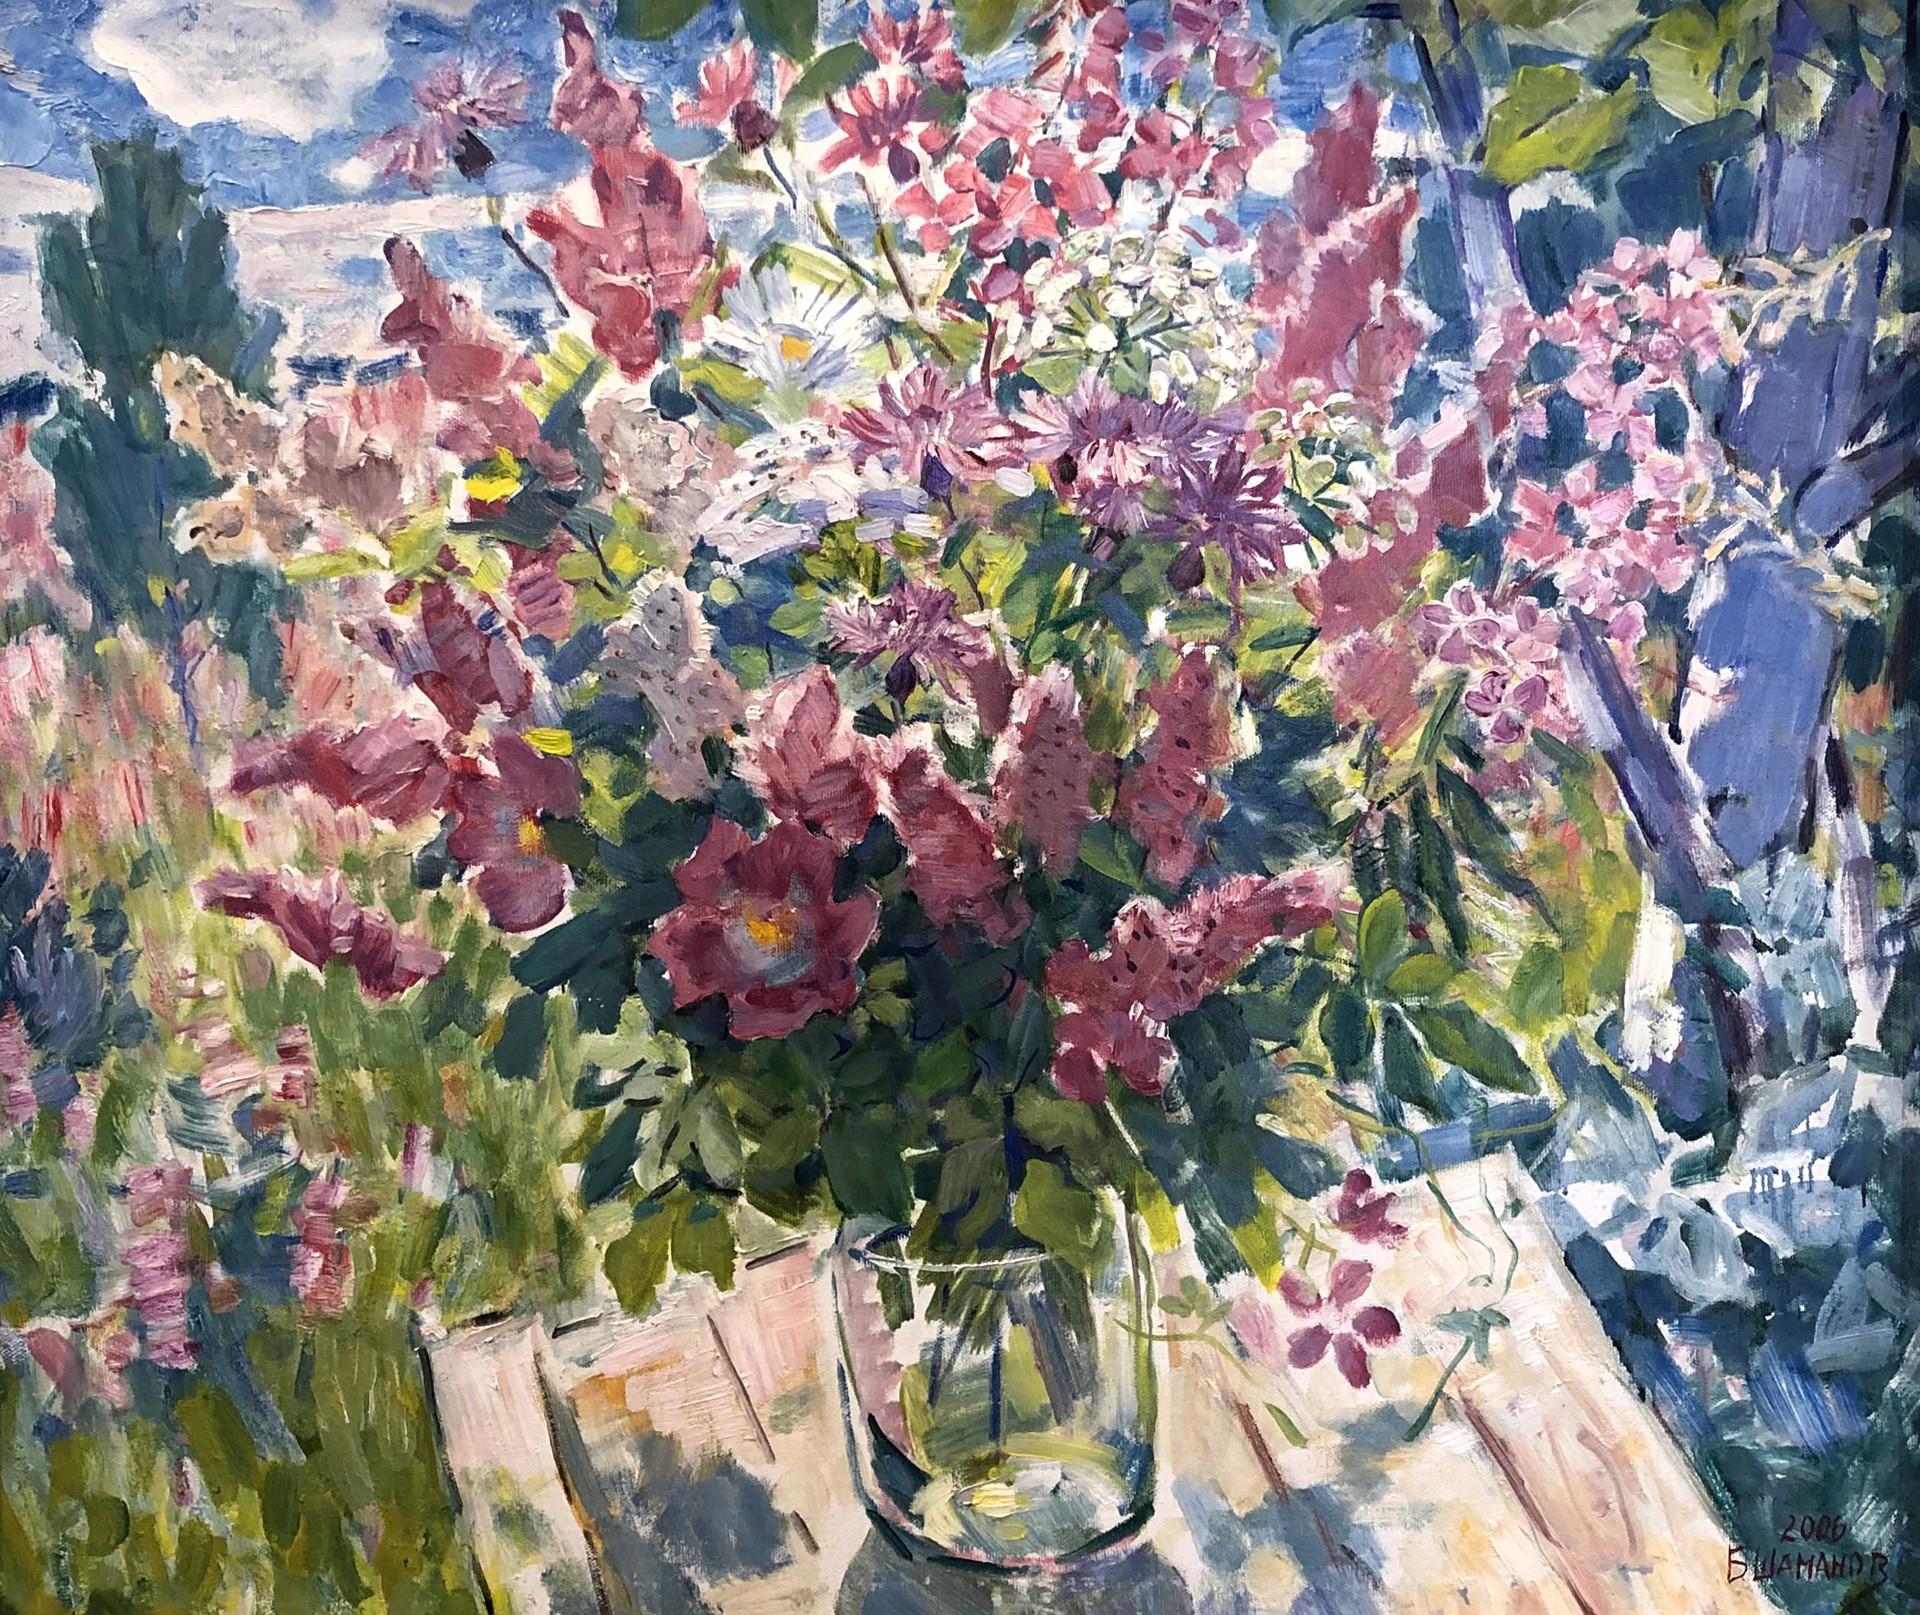 Boris Ivanovich Shamanov - Summer Afternoon by Russian Artists